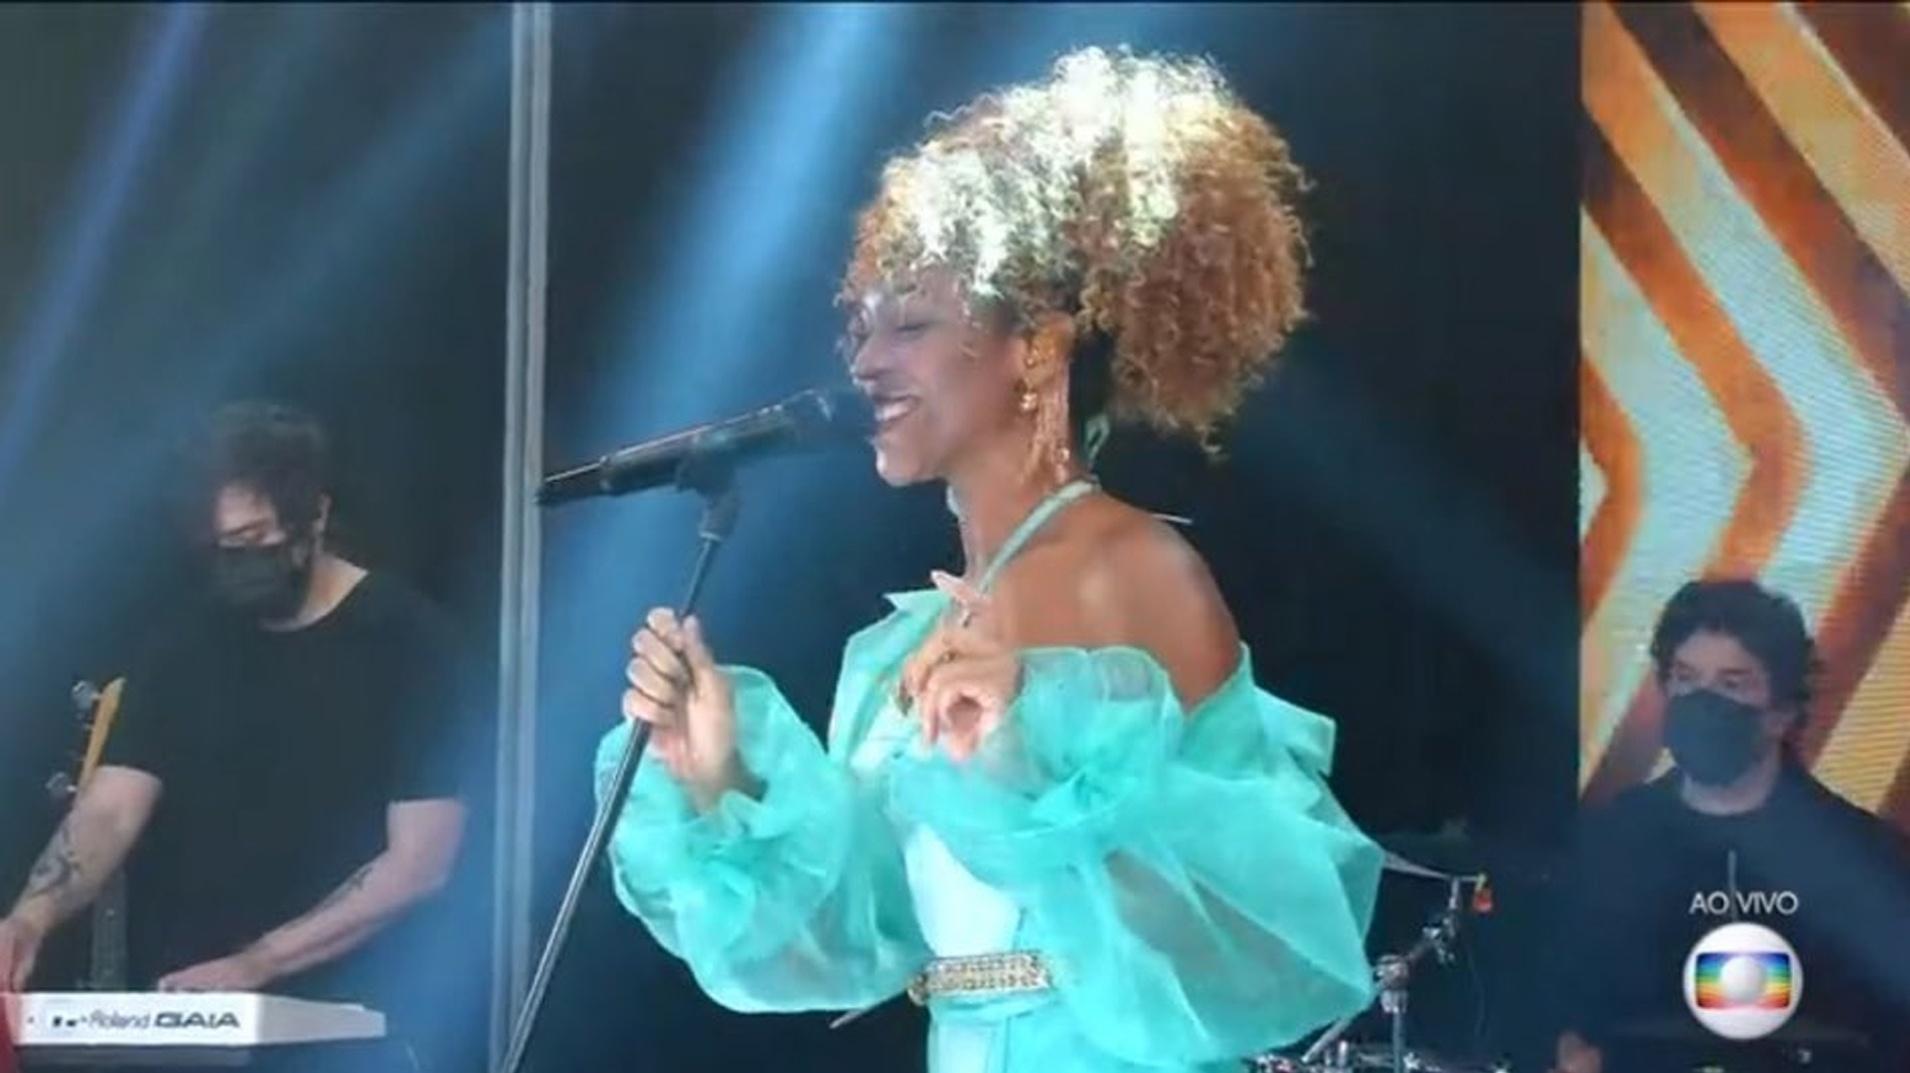 BBB 21: Karol Conká si esibisce nella finale BBB - Clone / Globoplay